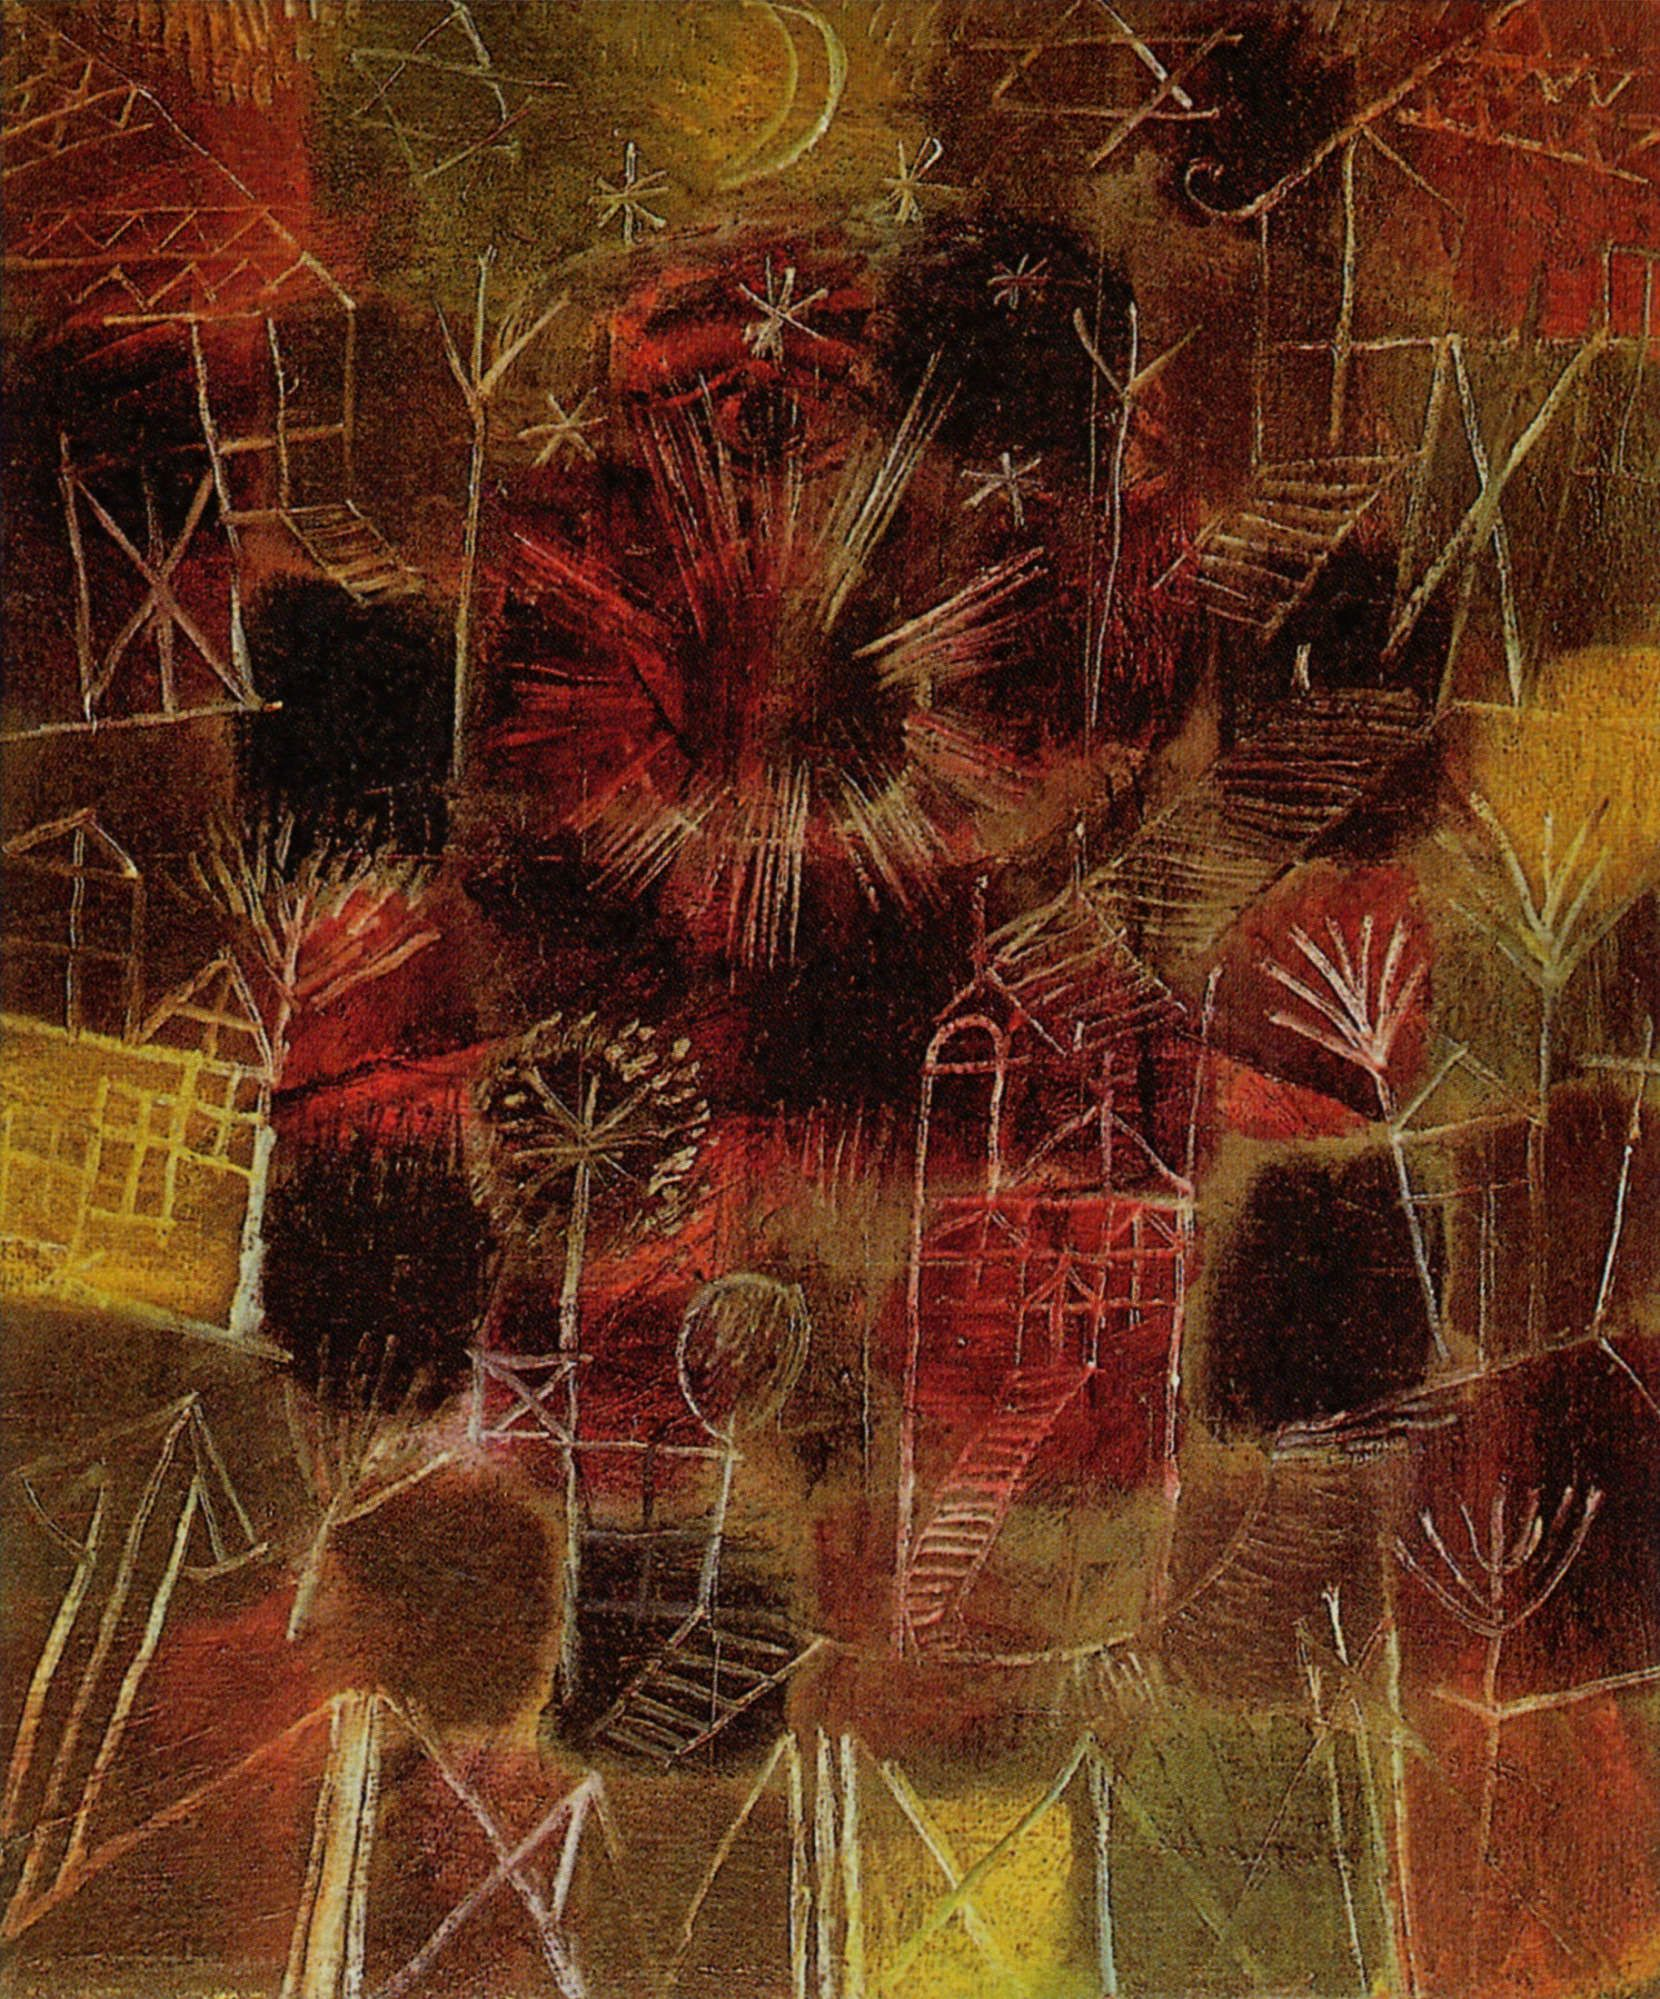 Paul Klee  http://gazette-ic.com/post/90249289035/paul-klee